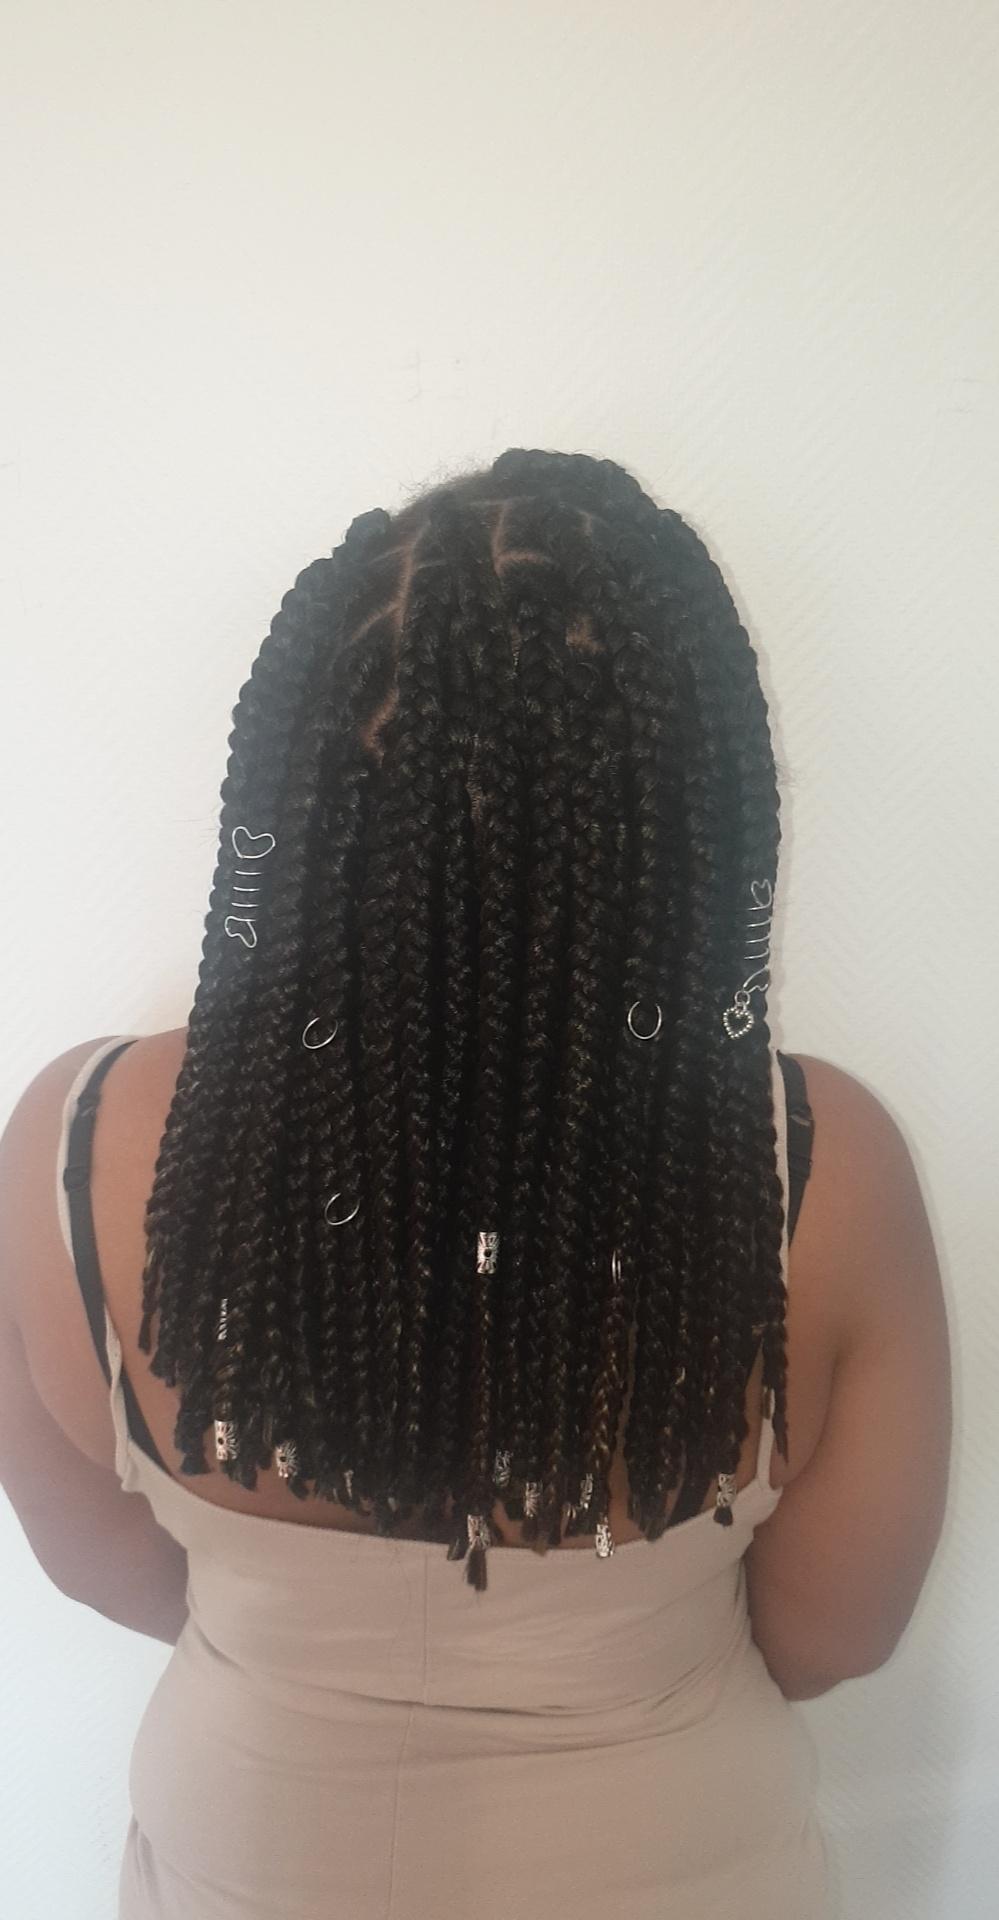 salon de coiffure afro tresse tresses box braids crochet braids vanilles tissages paris 75 77 78 91 92 93 94 95 DYBFMMMQ